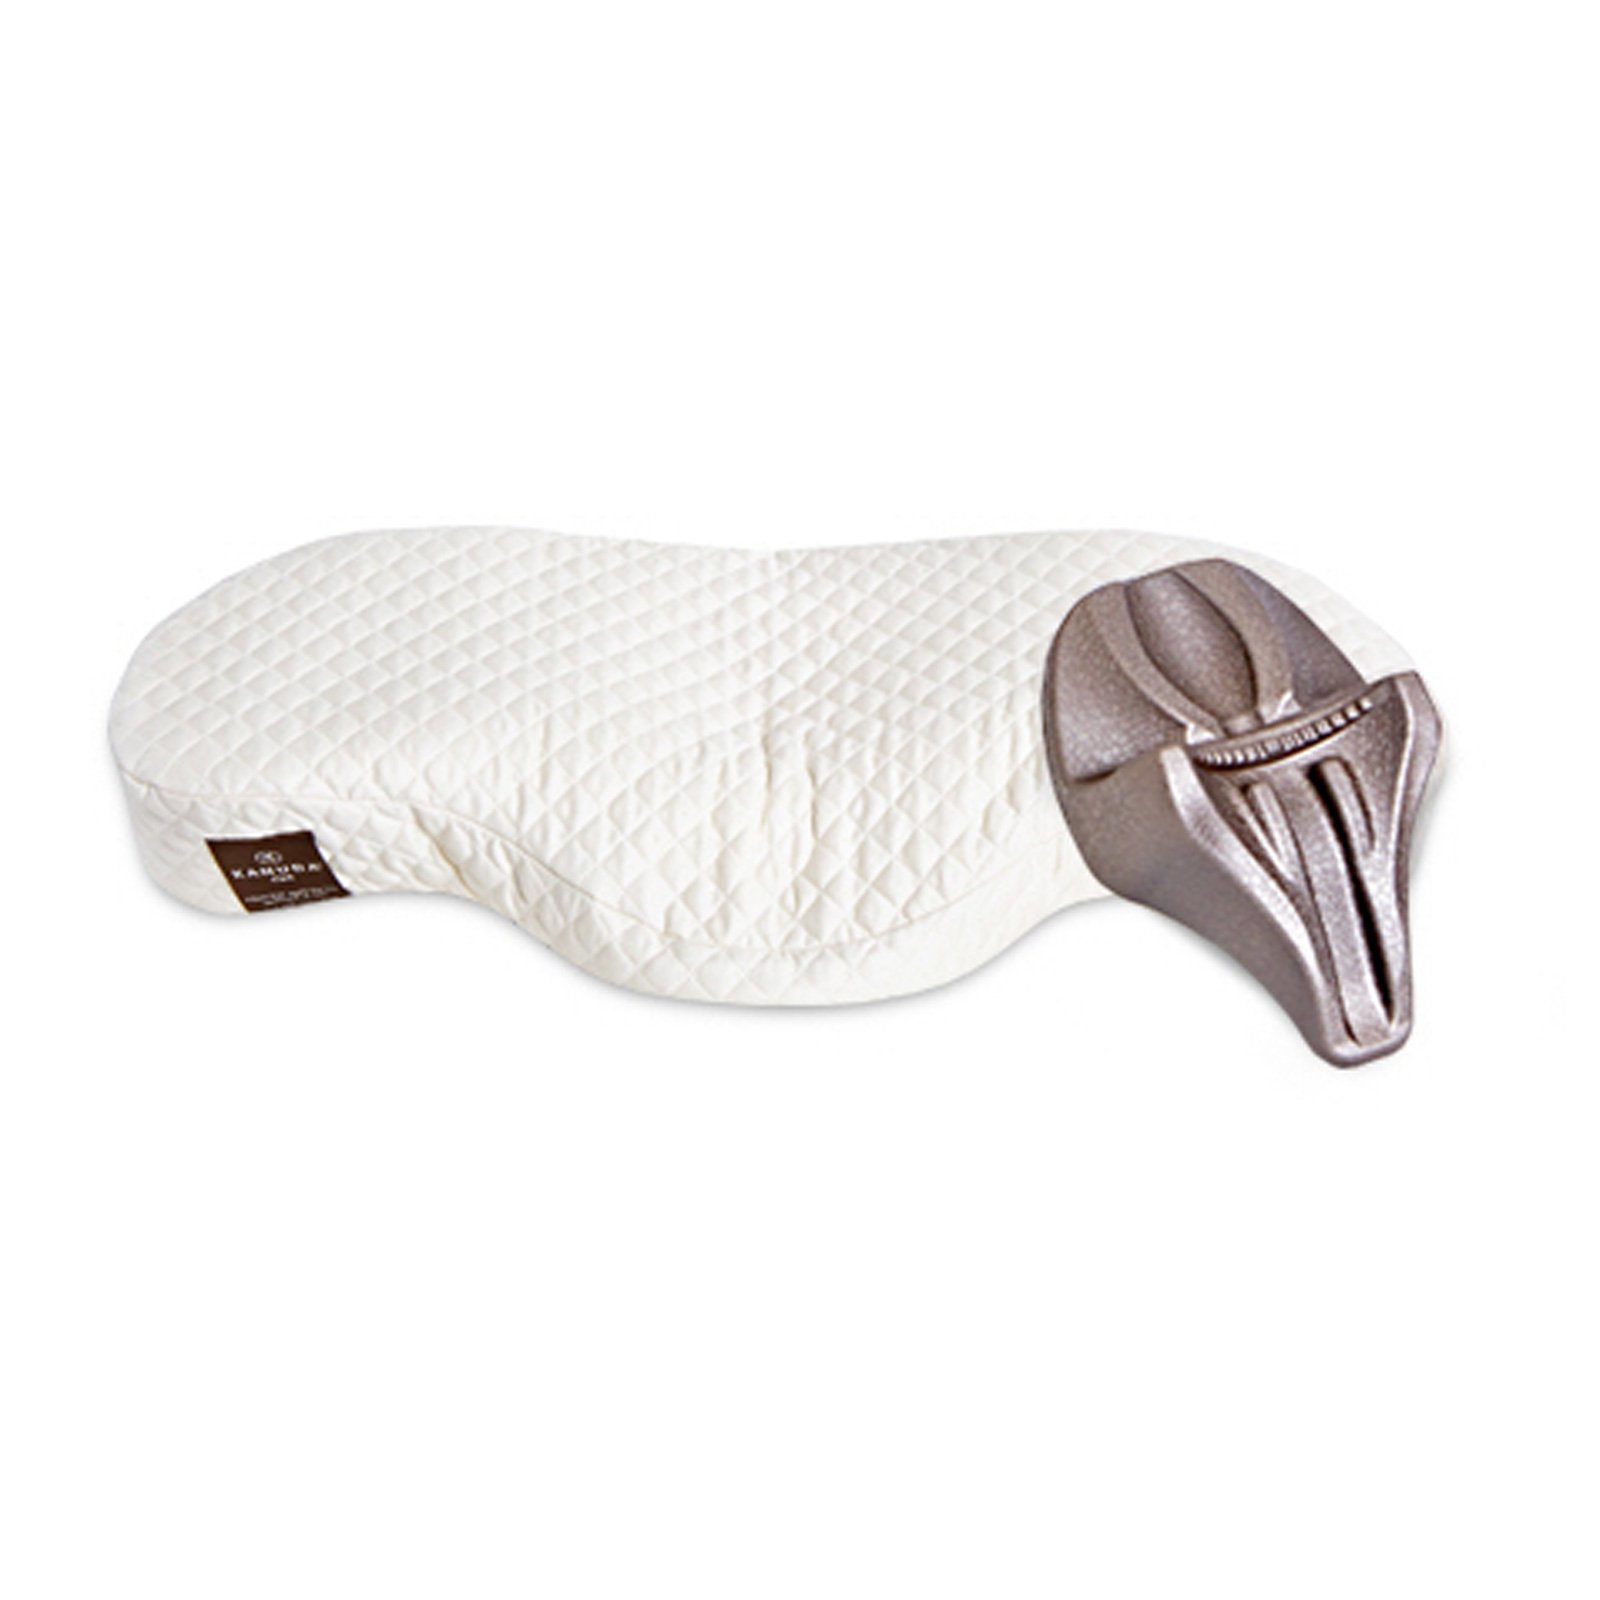 Kanuda CV4 Memory Foam Orthopedic Pillow Health Sleep Single Set (Pillow 1 + a Nap)